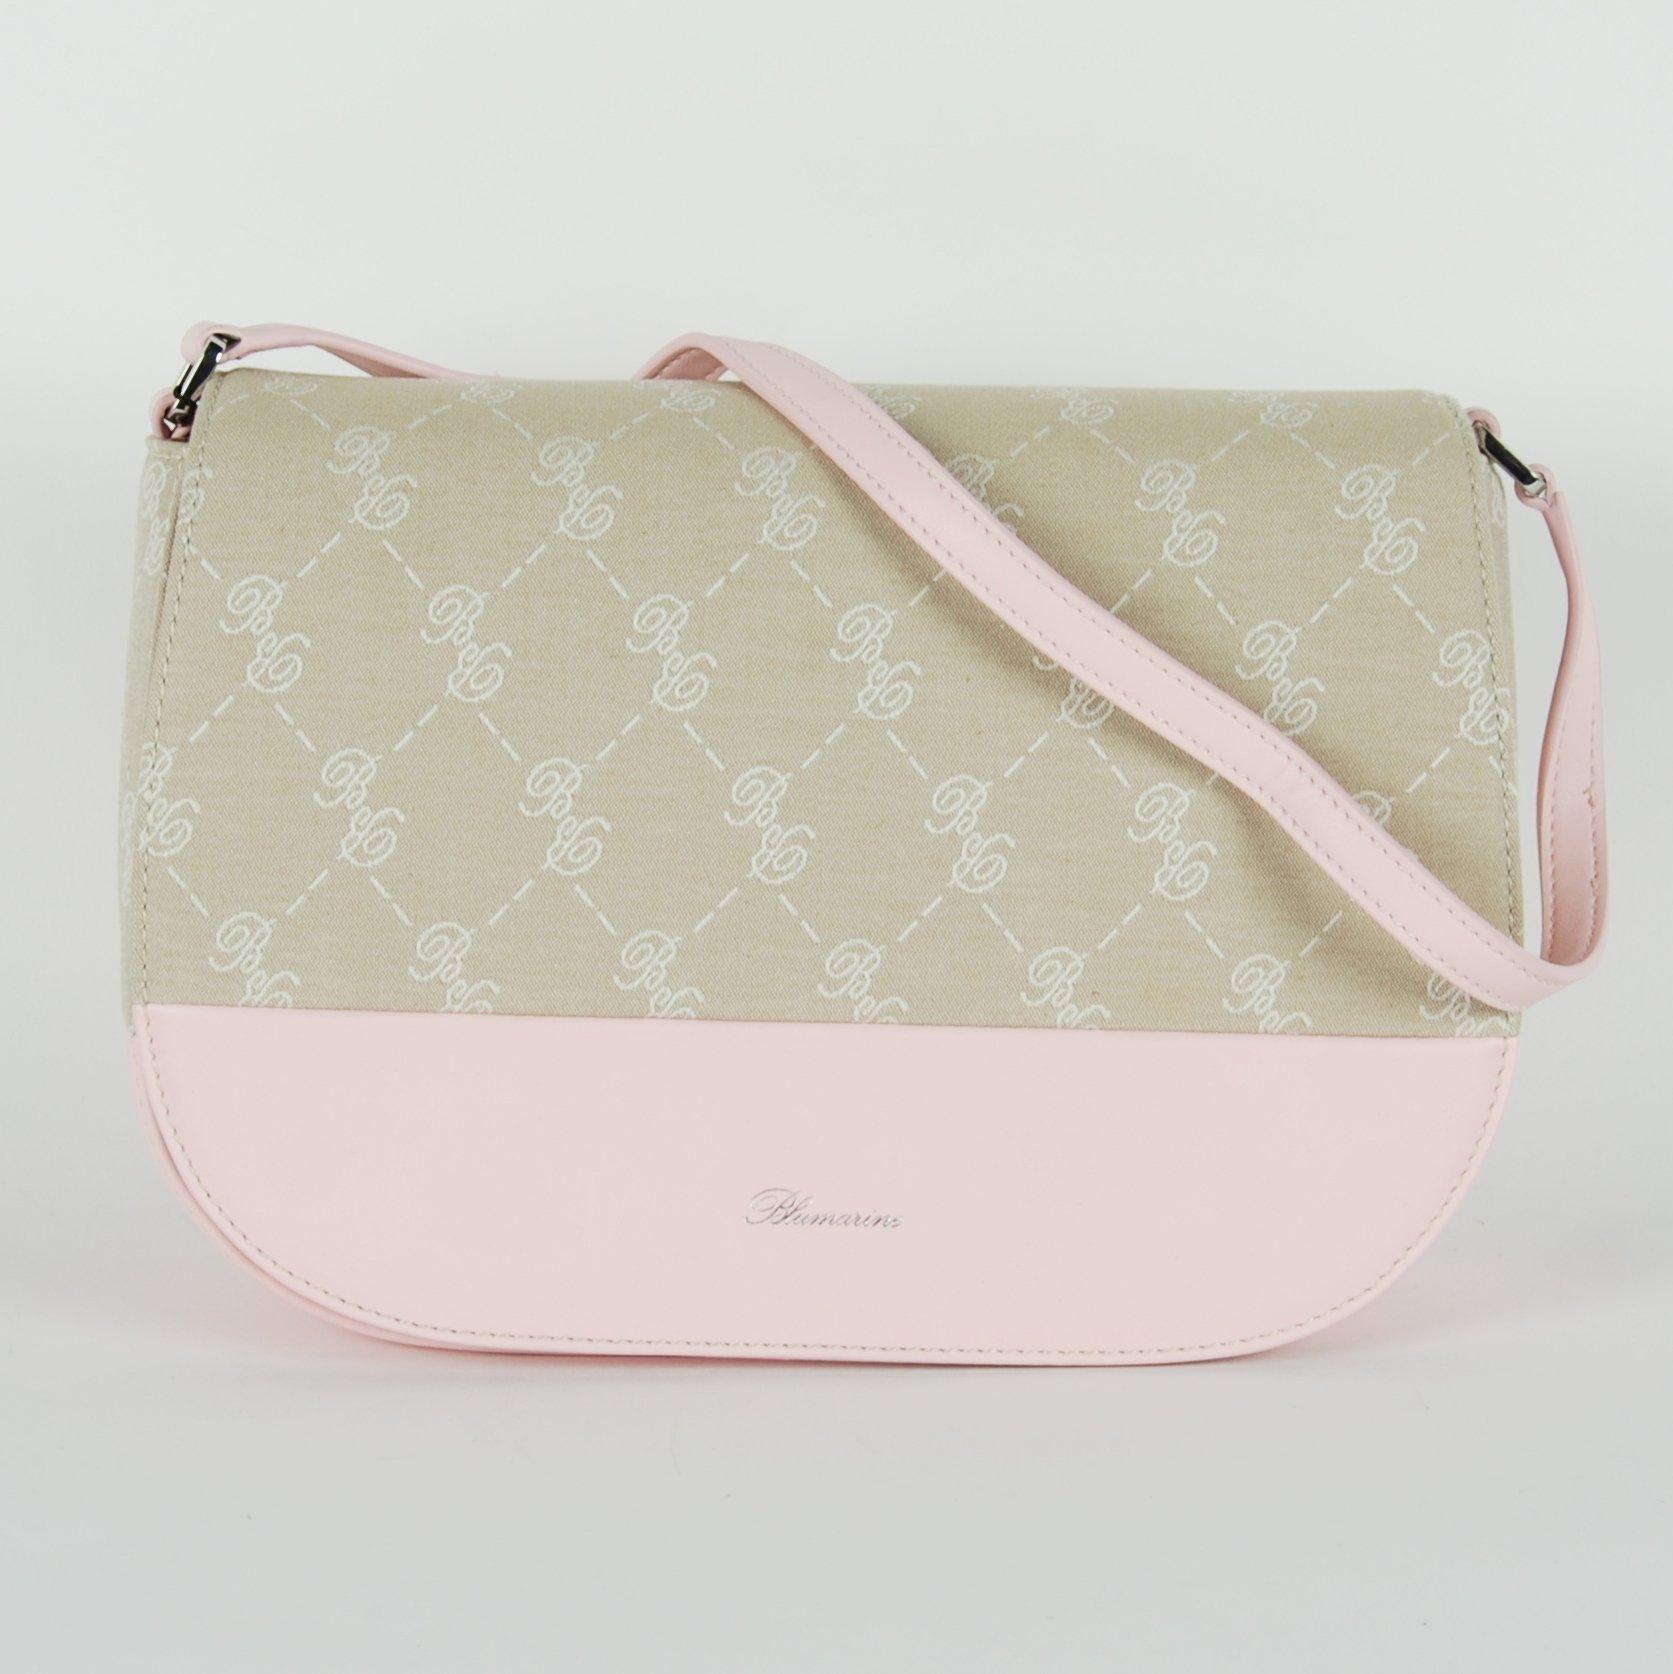 Blumarine Women's Shoulder Bag Pink BL1421515